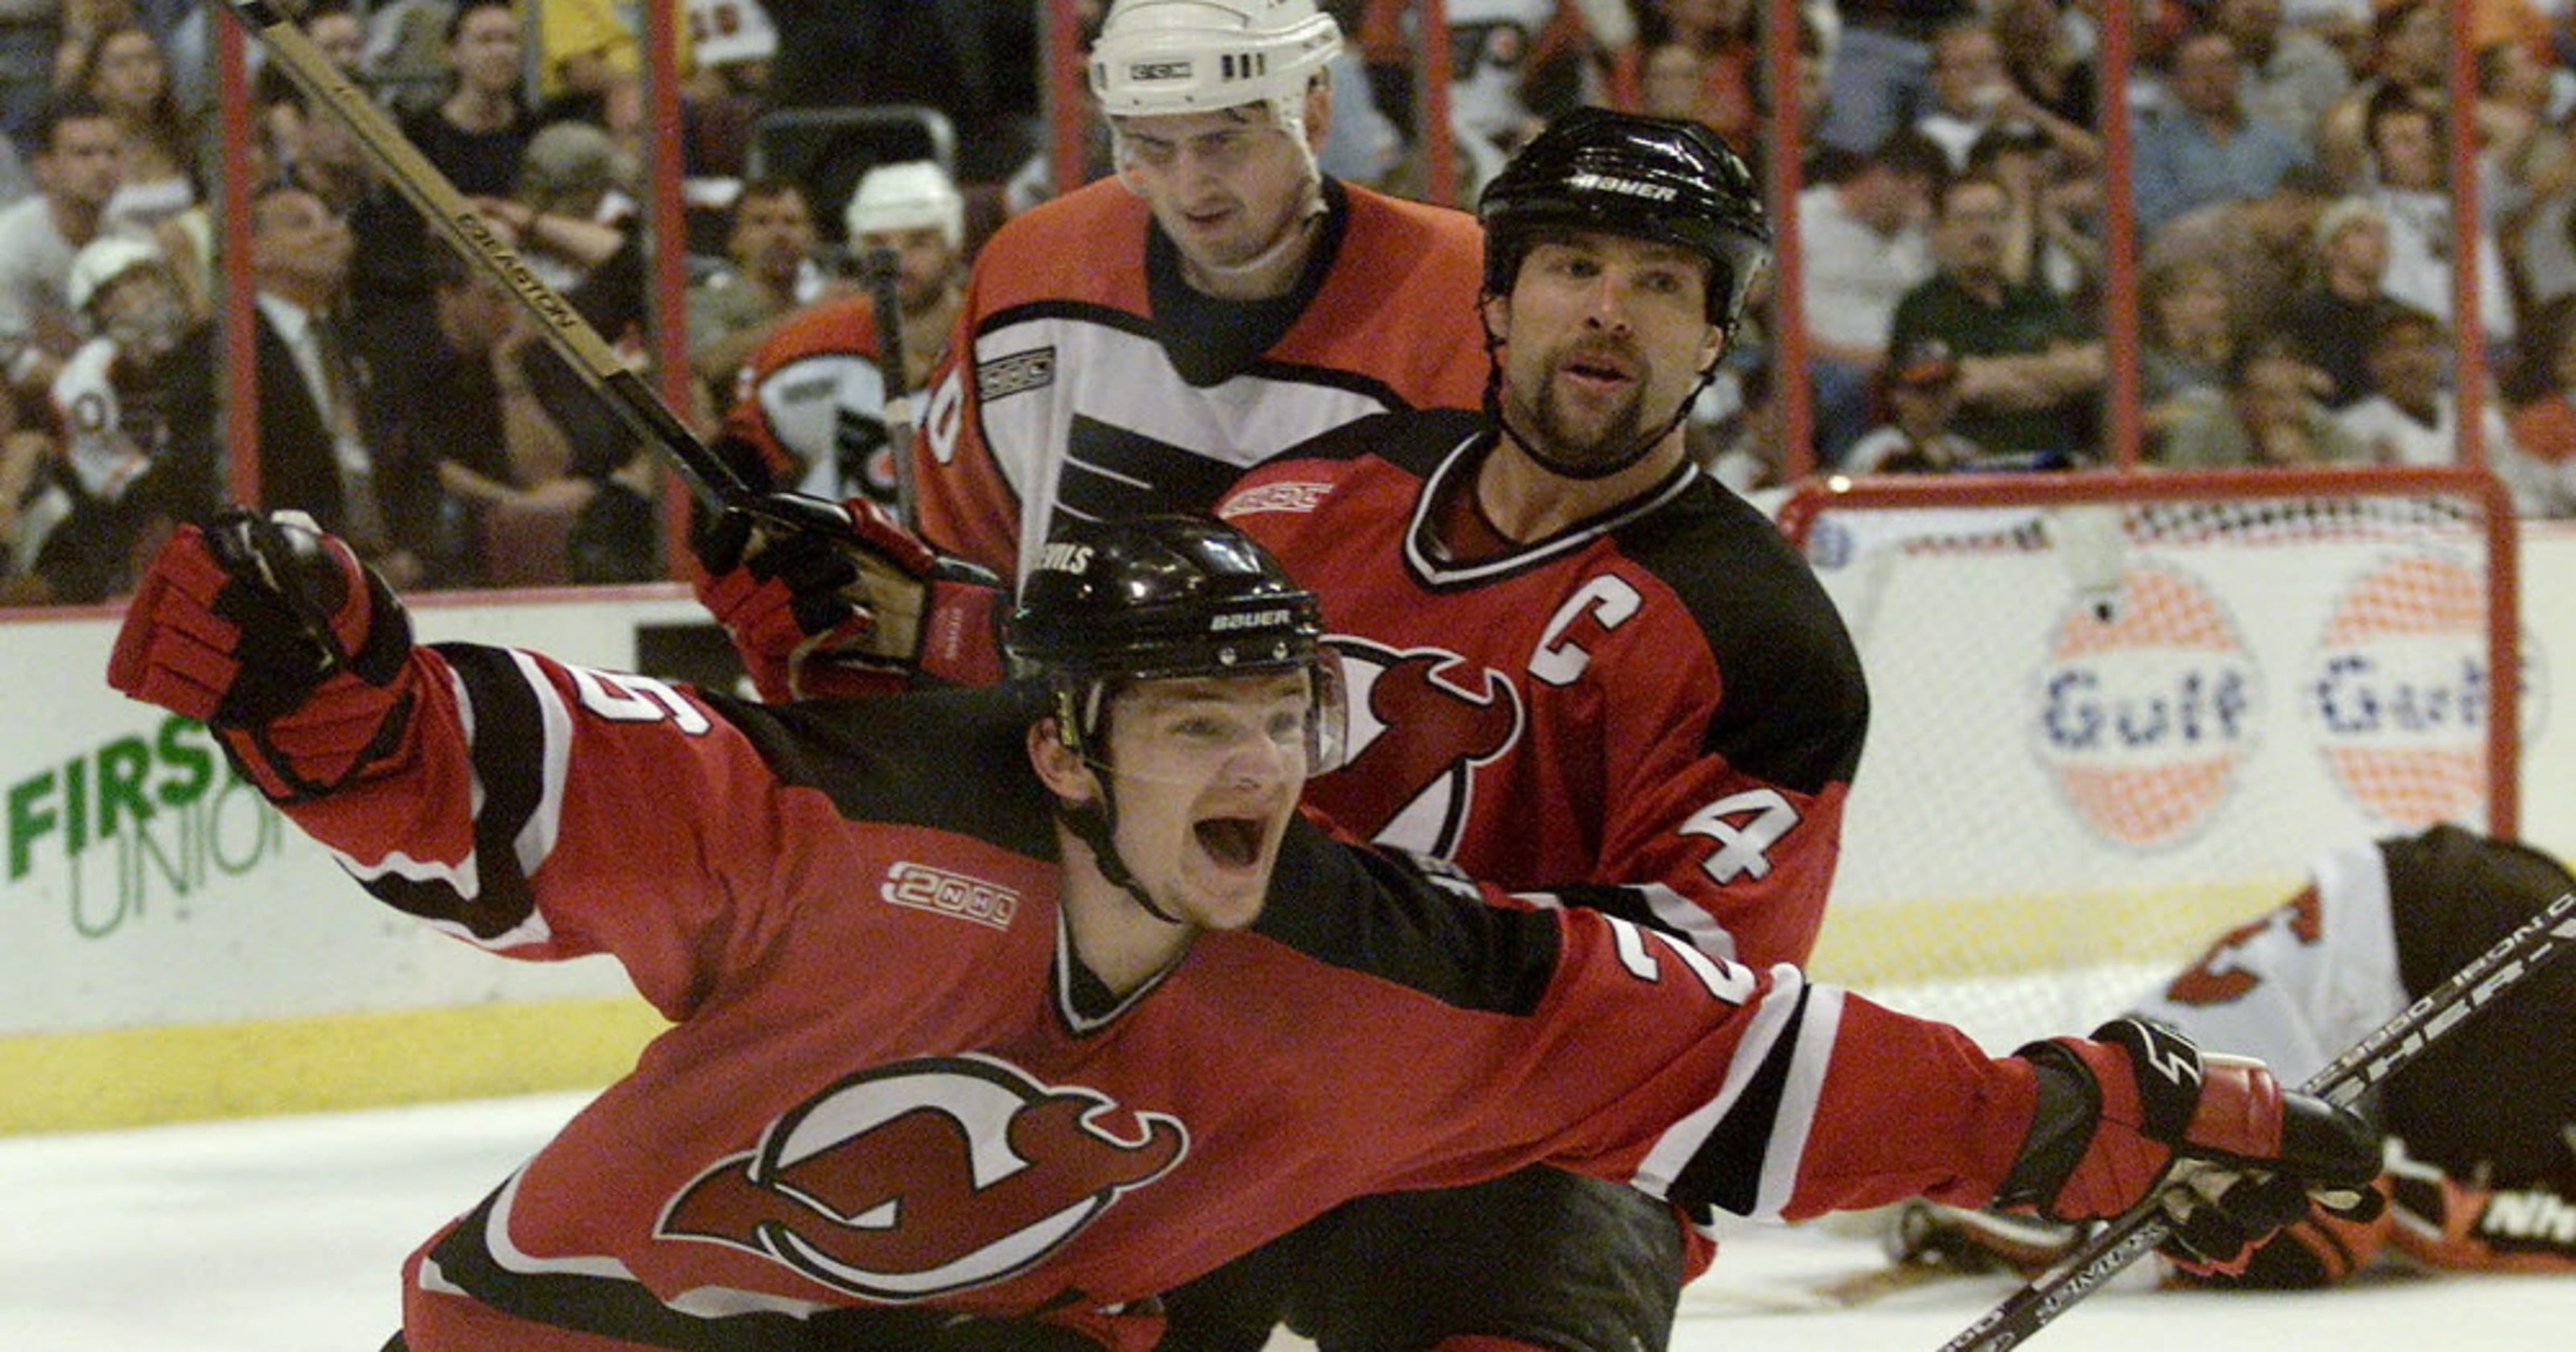 NHL Network hires Devils Hall of Famer Scott Stevens 8be2fde94